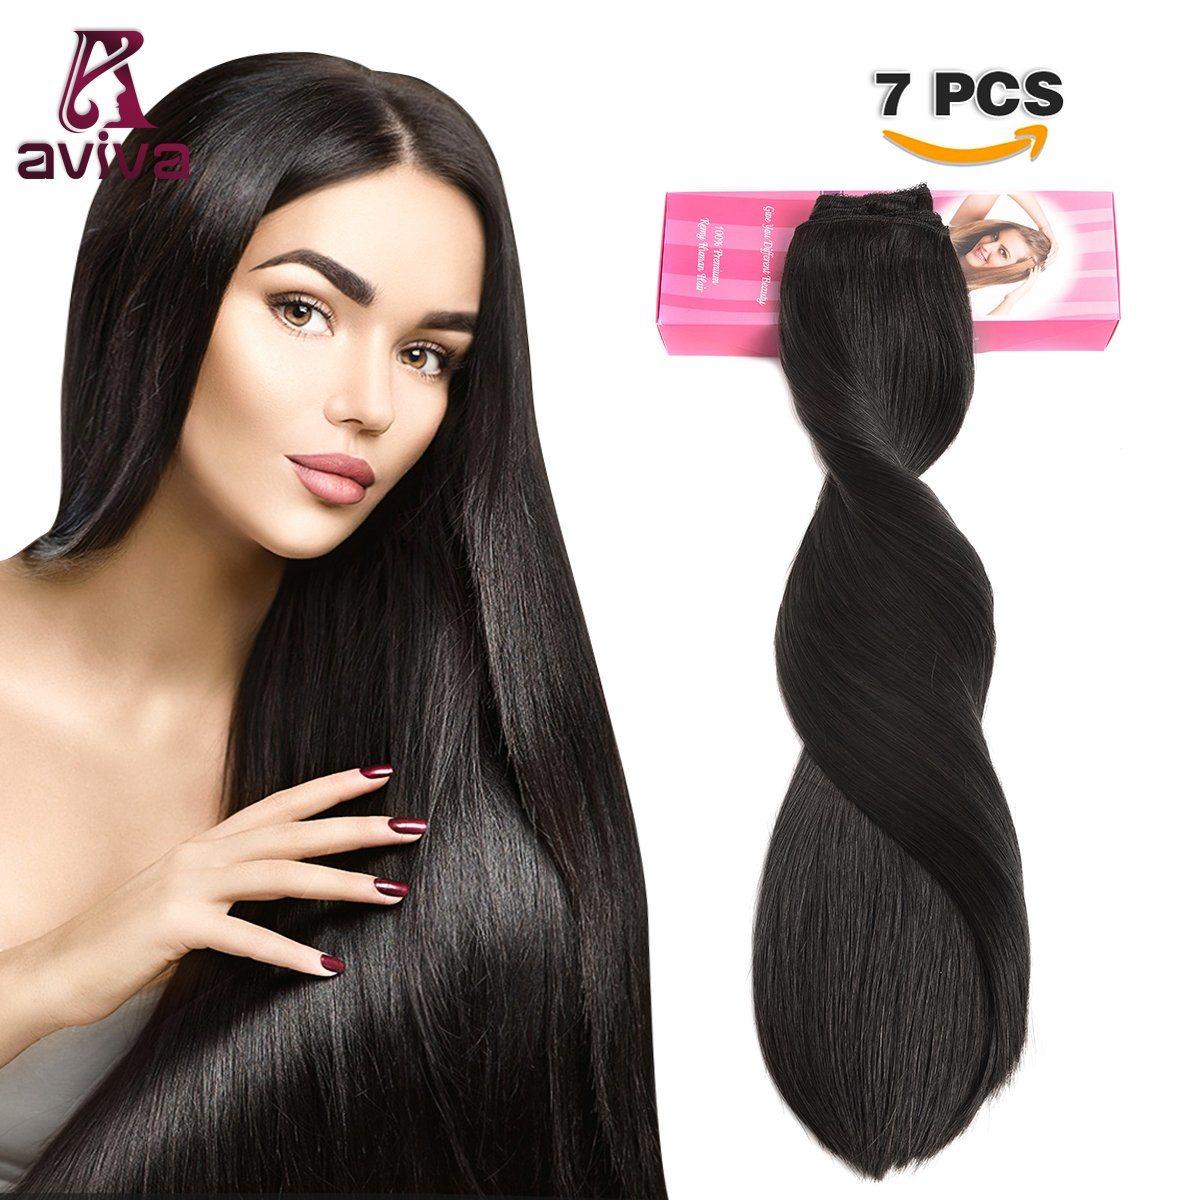 c2e36f06936 [Hot Item] 100% Remy Human Hair Clip in Hair Extension 7PCS for Full Head  (AV-CHL07-14)